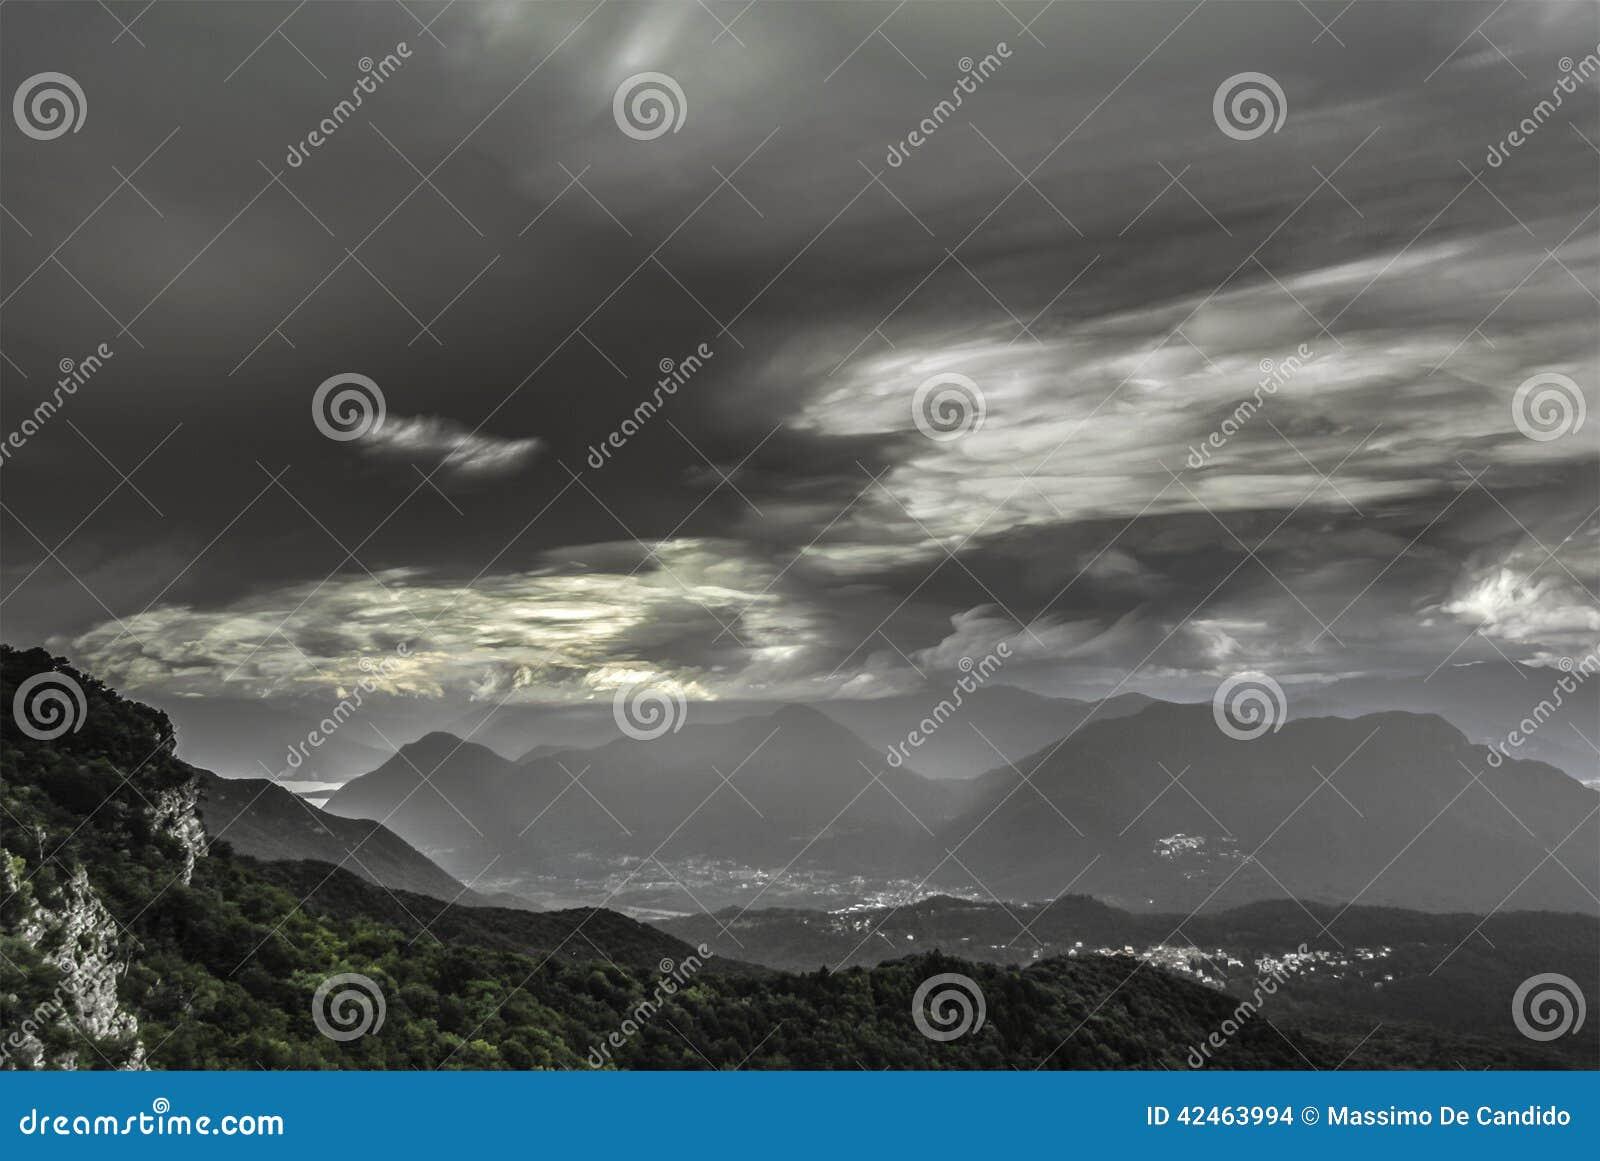 Wolken am Horizont, Campo-dei Fiori - Varese